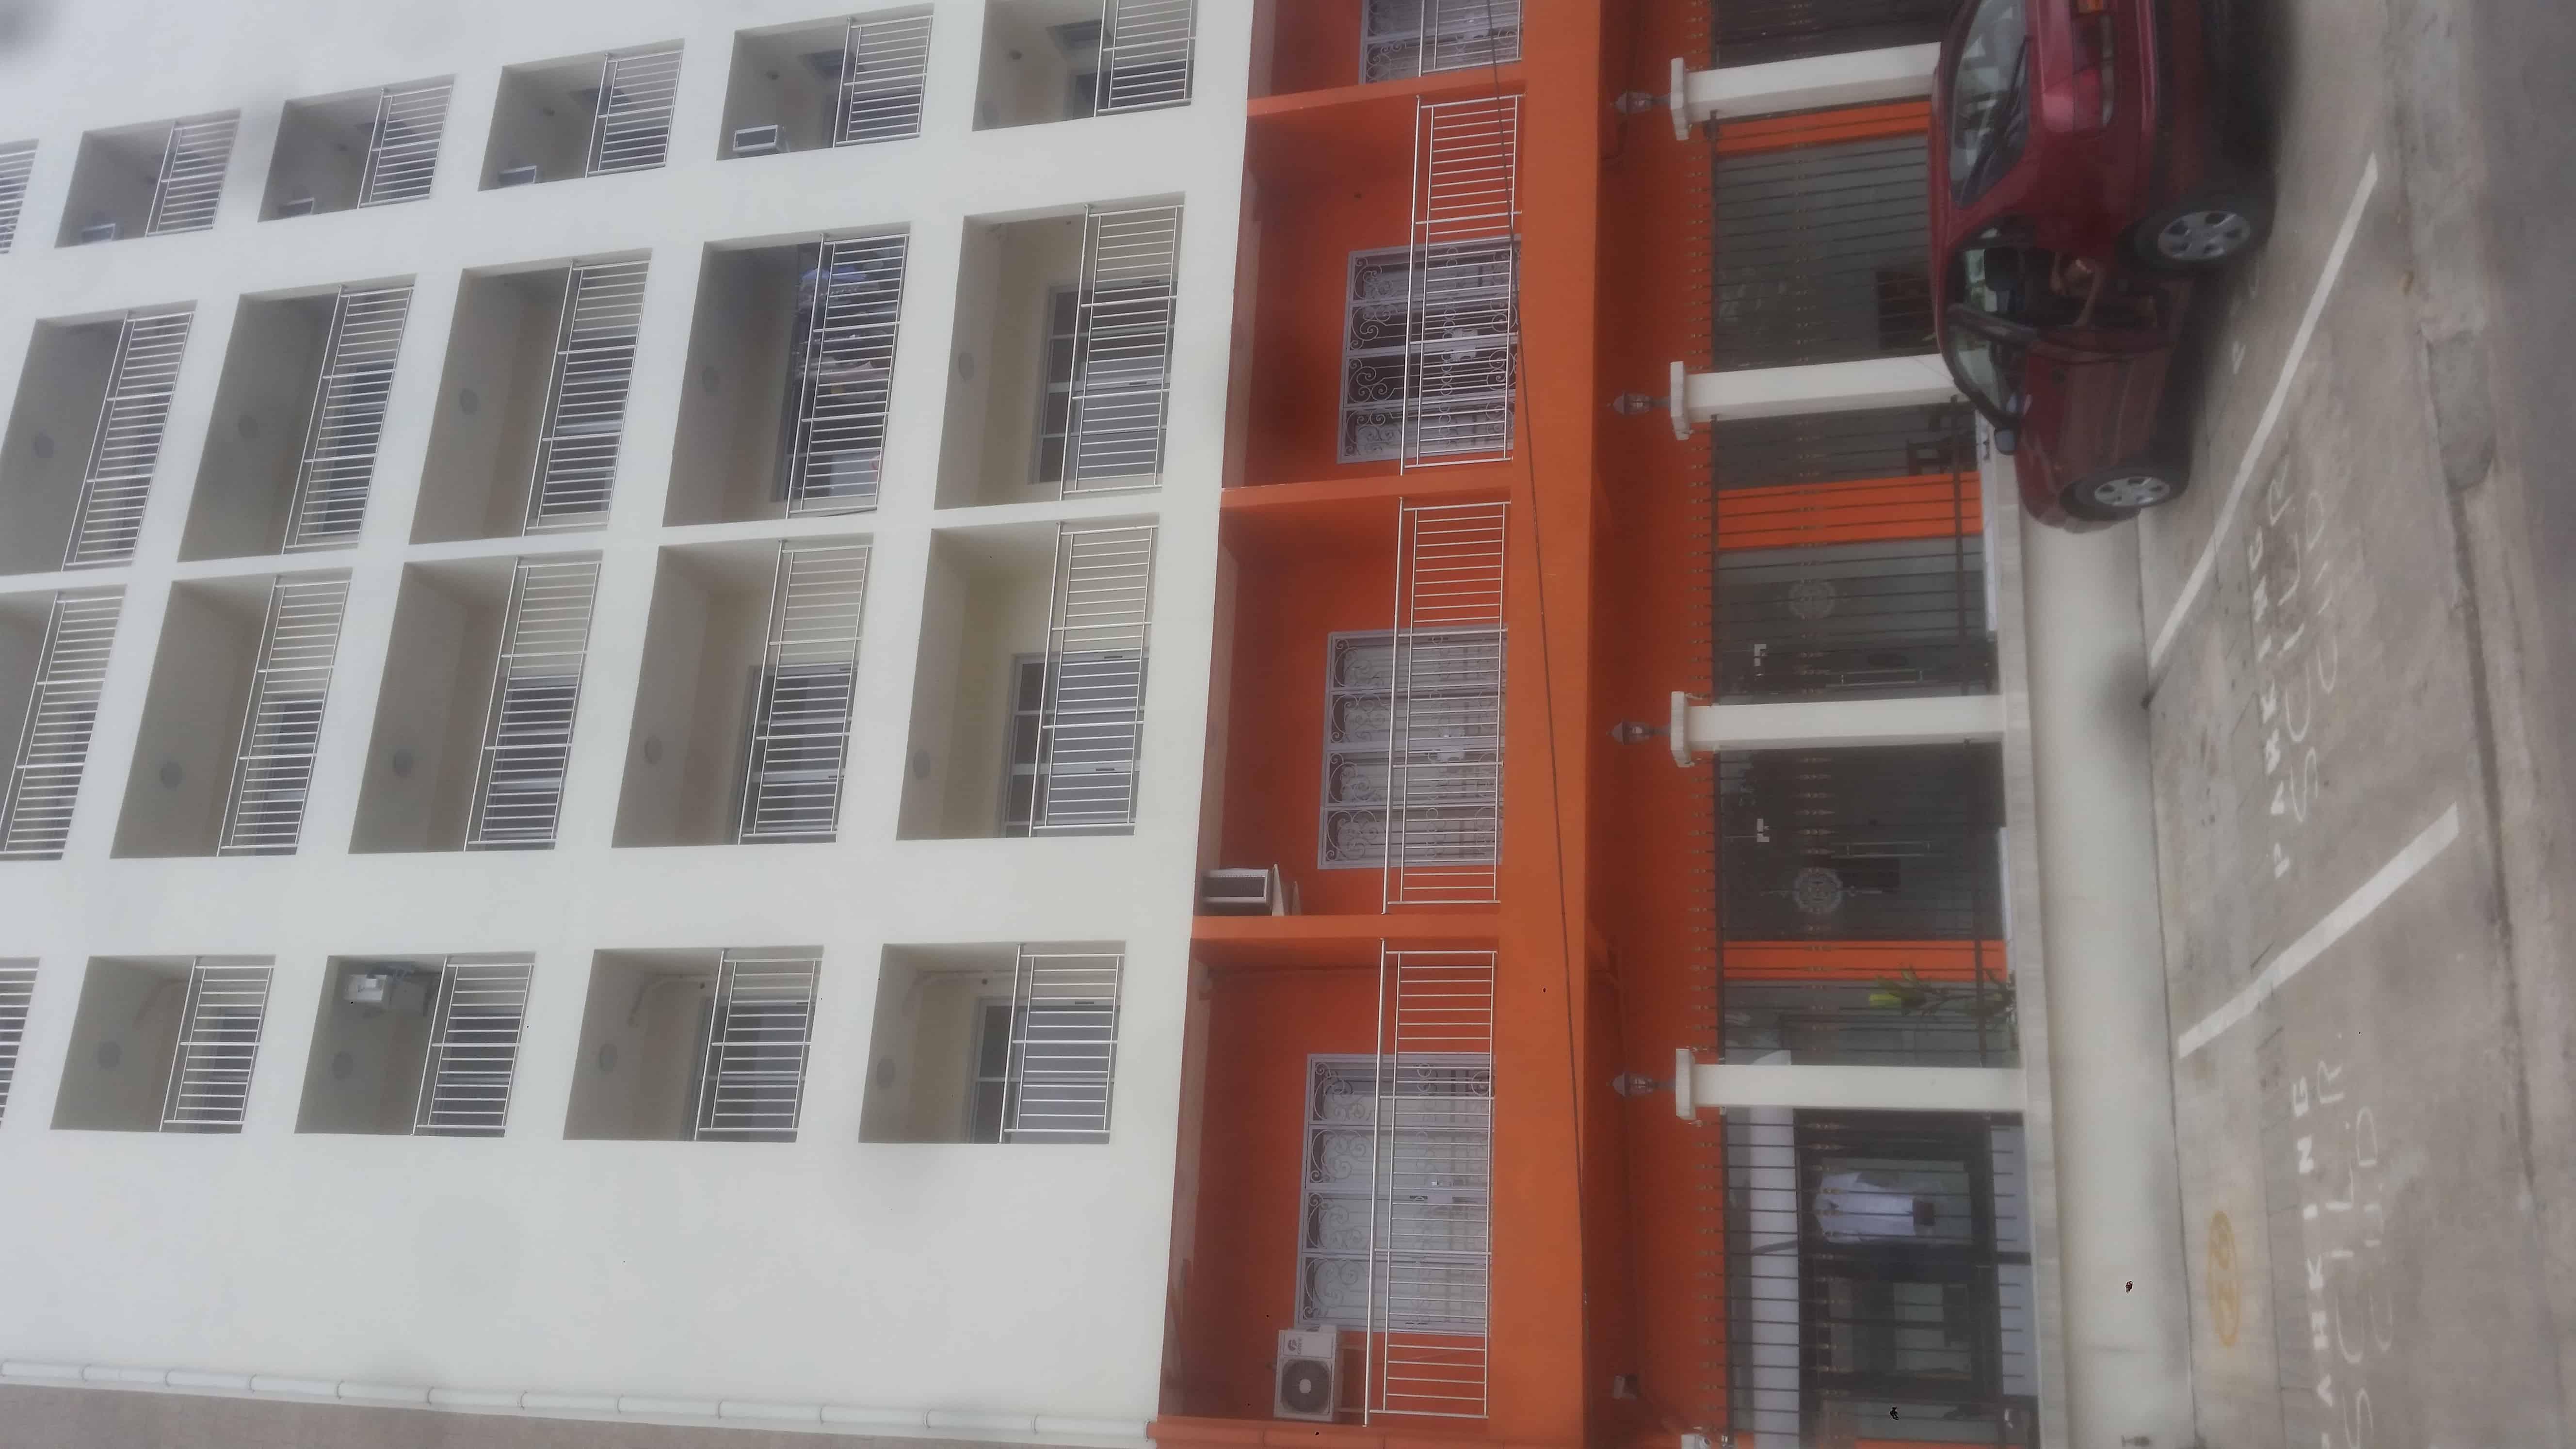 Apartment to rent - Douala, Bonapriso, soppo - 1 living room(s), 2 bedroom(s), 3 bathroom(s) - 450 000 FCFA / month